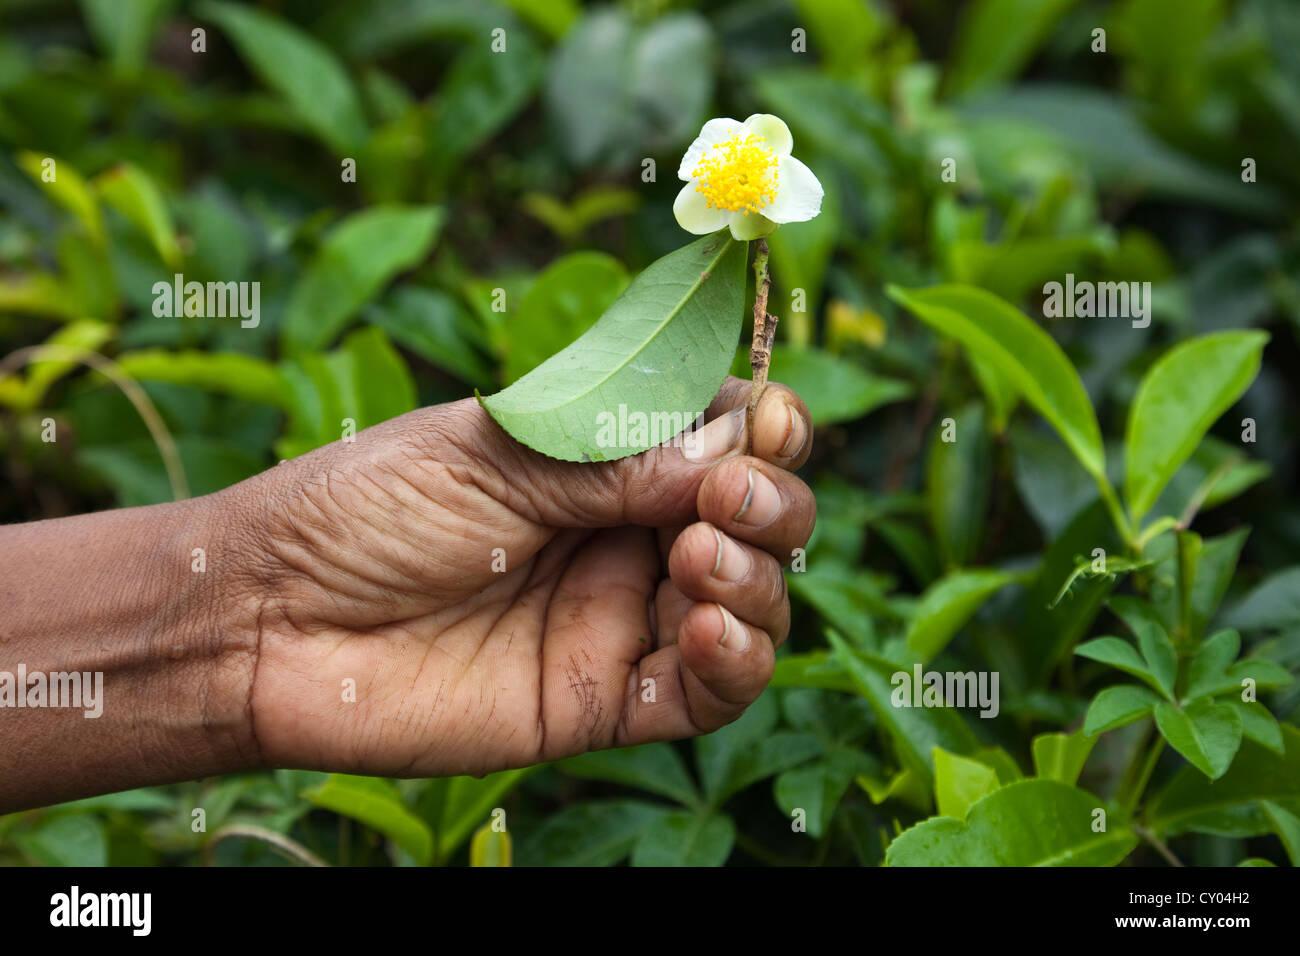 Woman's hand holding a flower from a tea bush, Sri Lanka Stock Photo